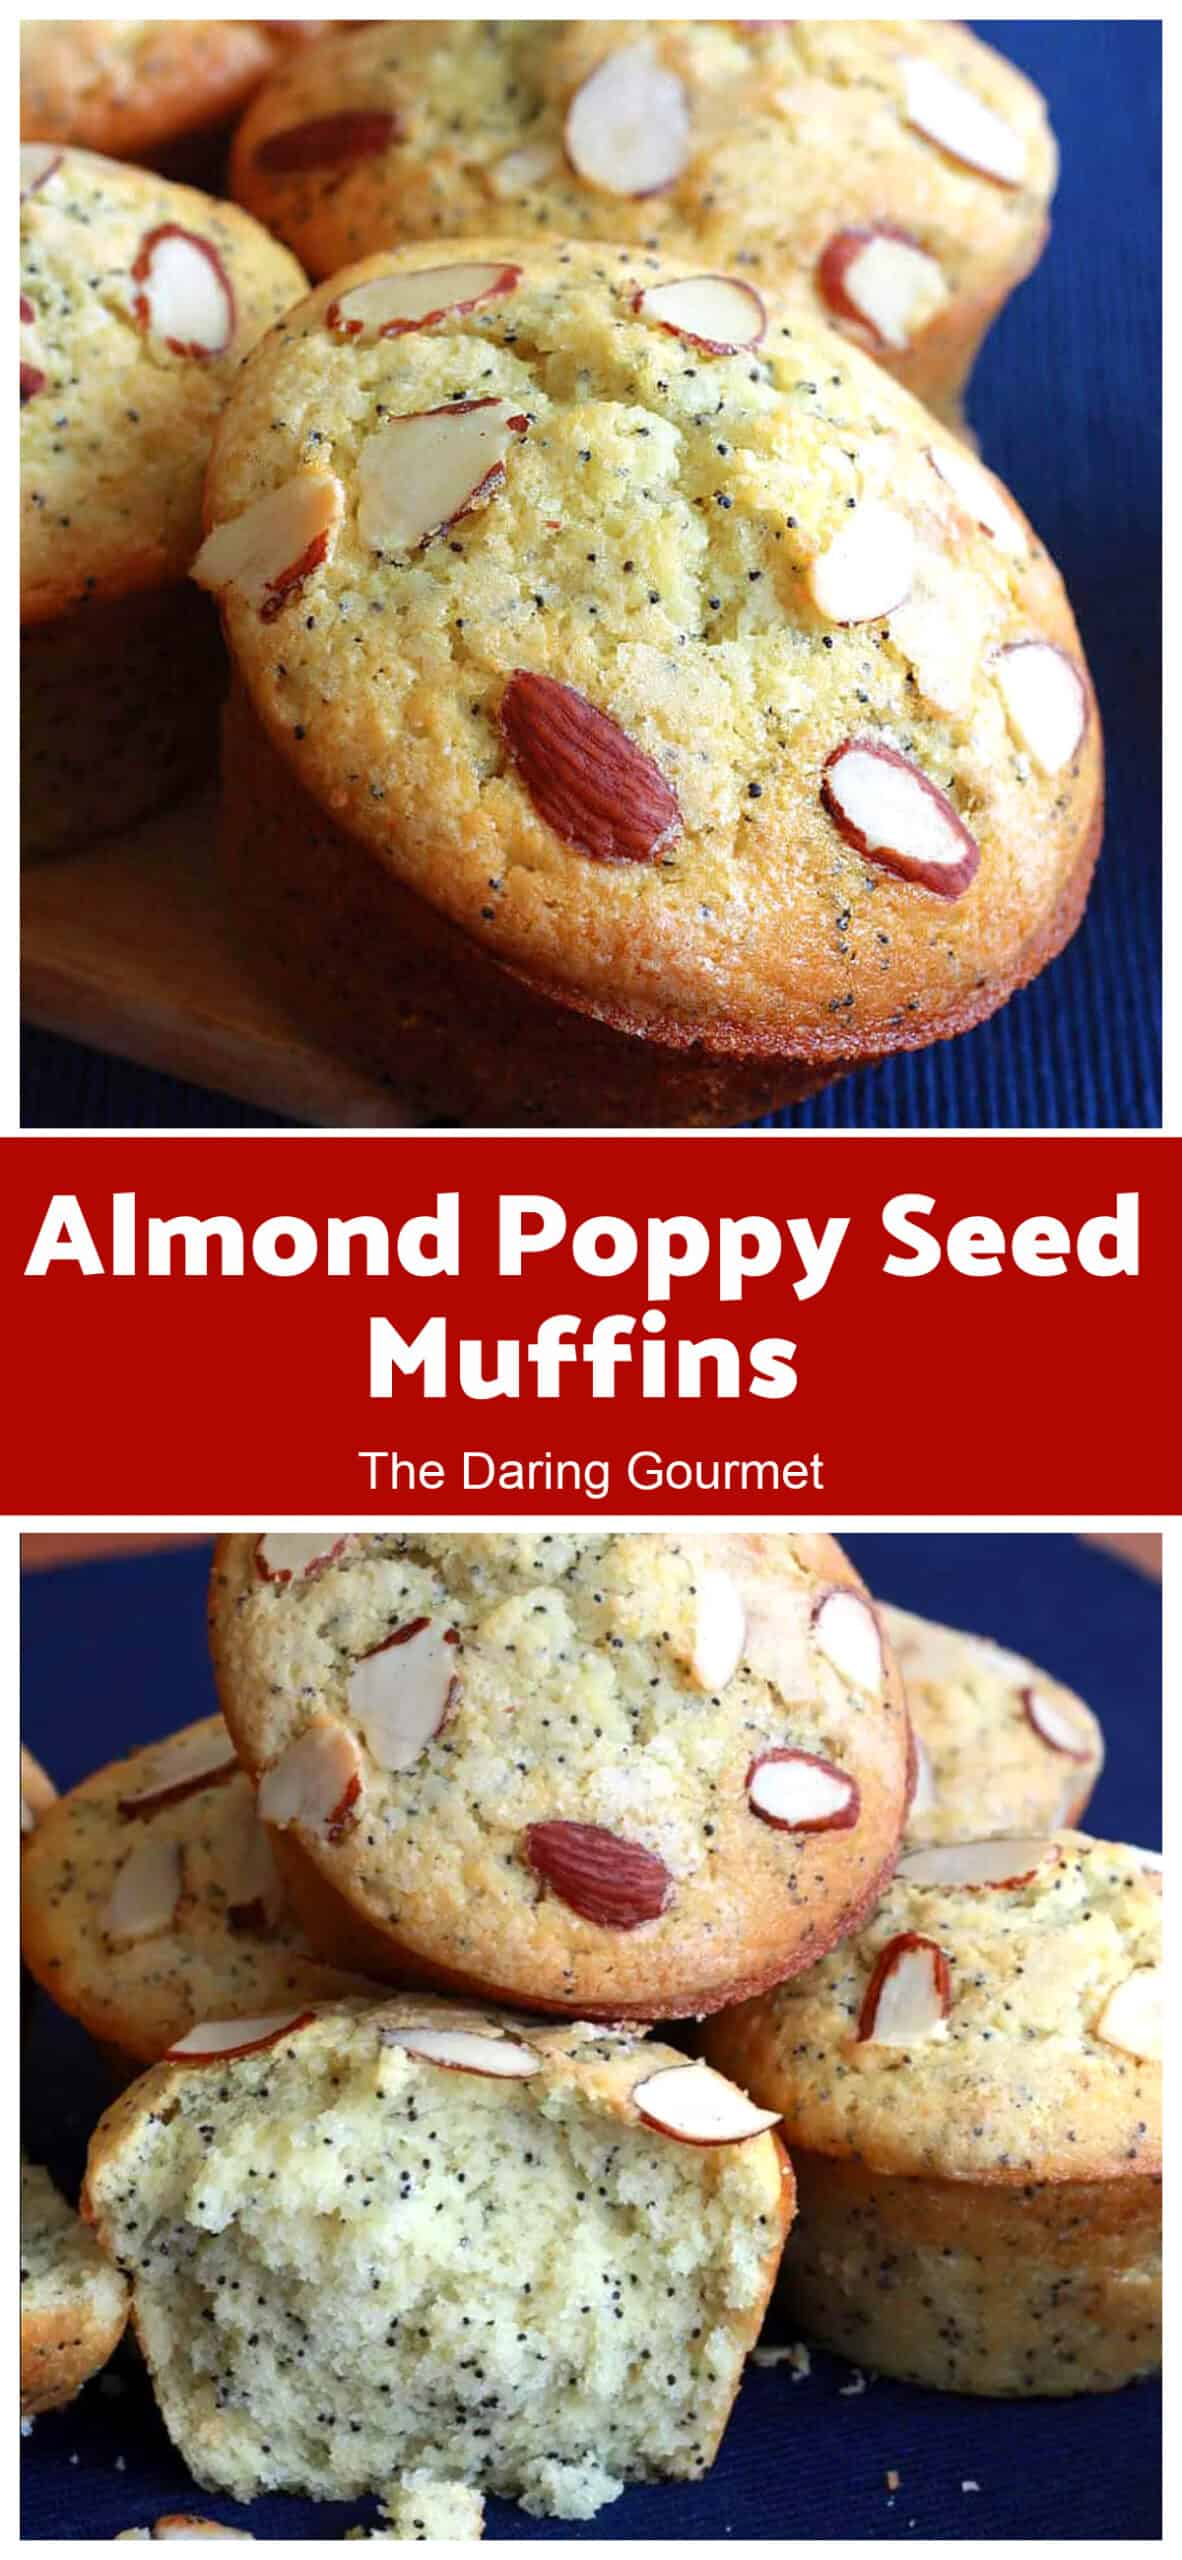 almond poppy seed muffins recipe best otis spunkmeyer copycat